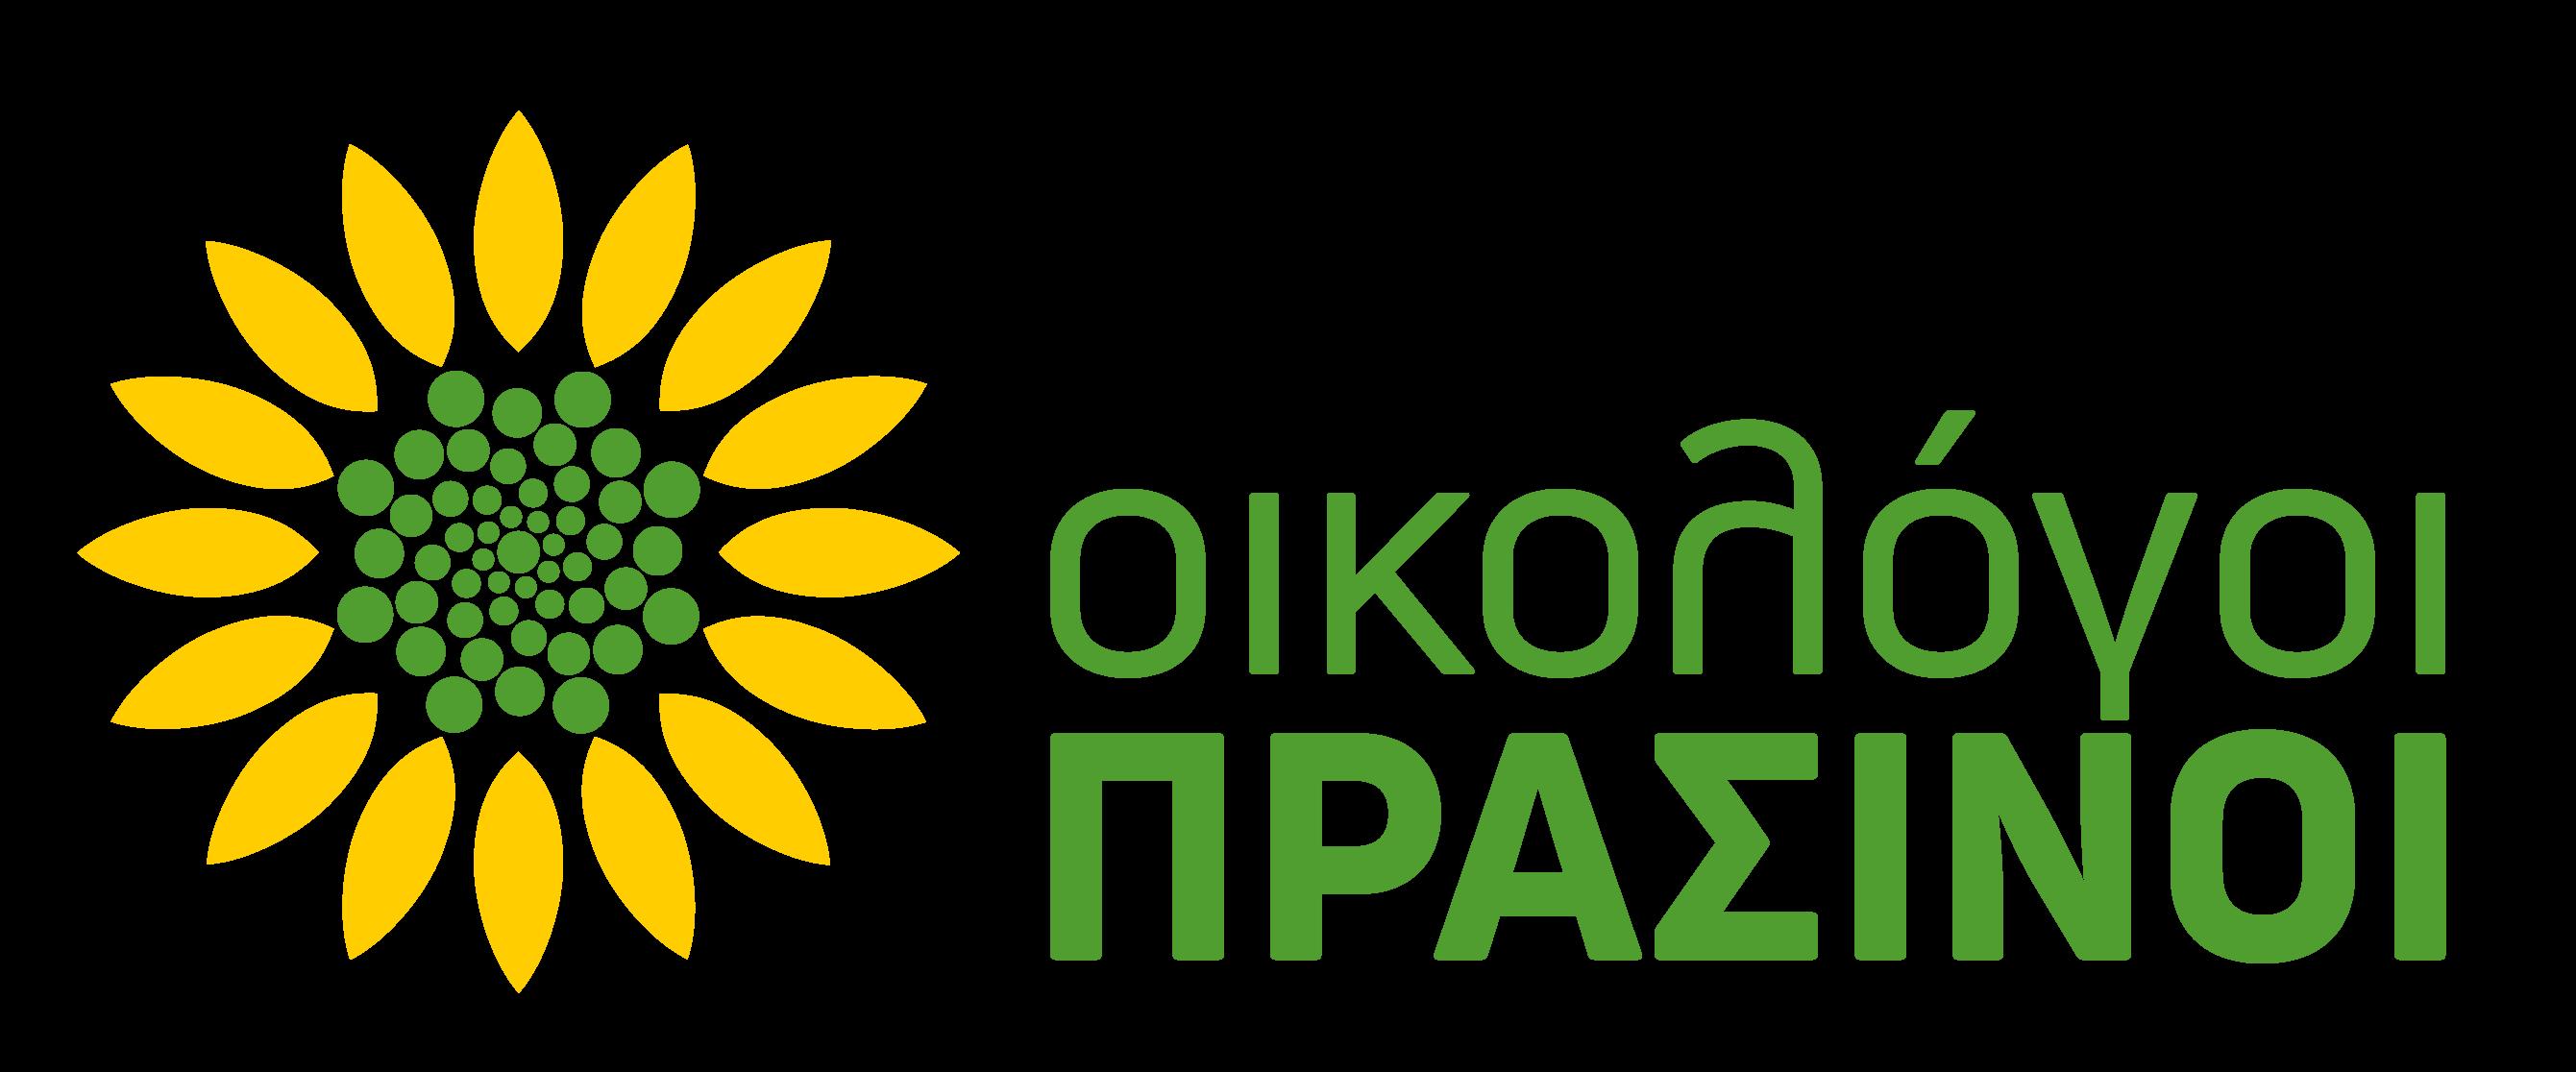 Ecologist_Greens_new_logo